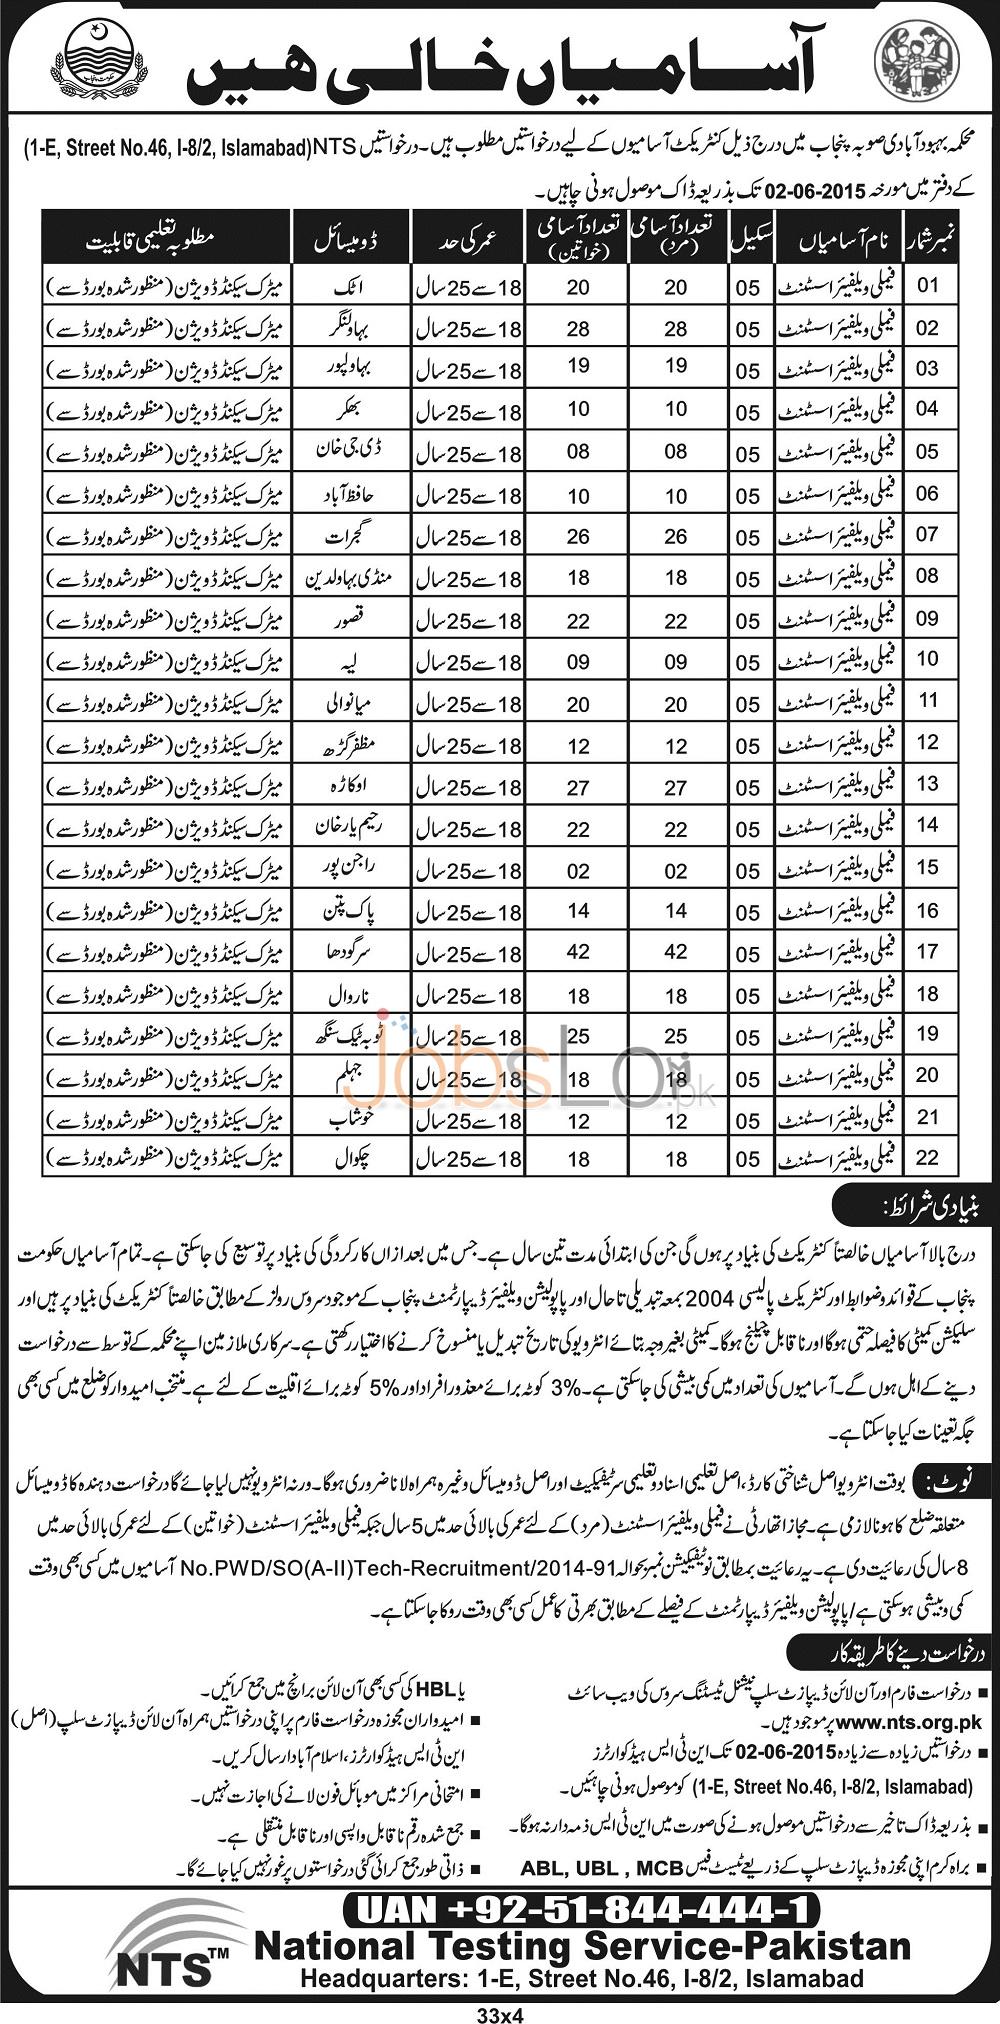 Population Welfare Department Punjab Family Welfare Assistant Jobs 2015 NTS Form